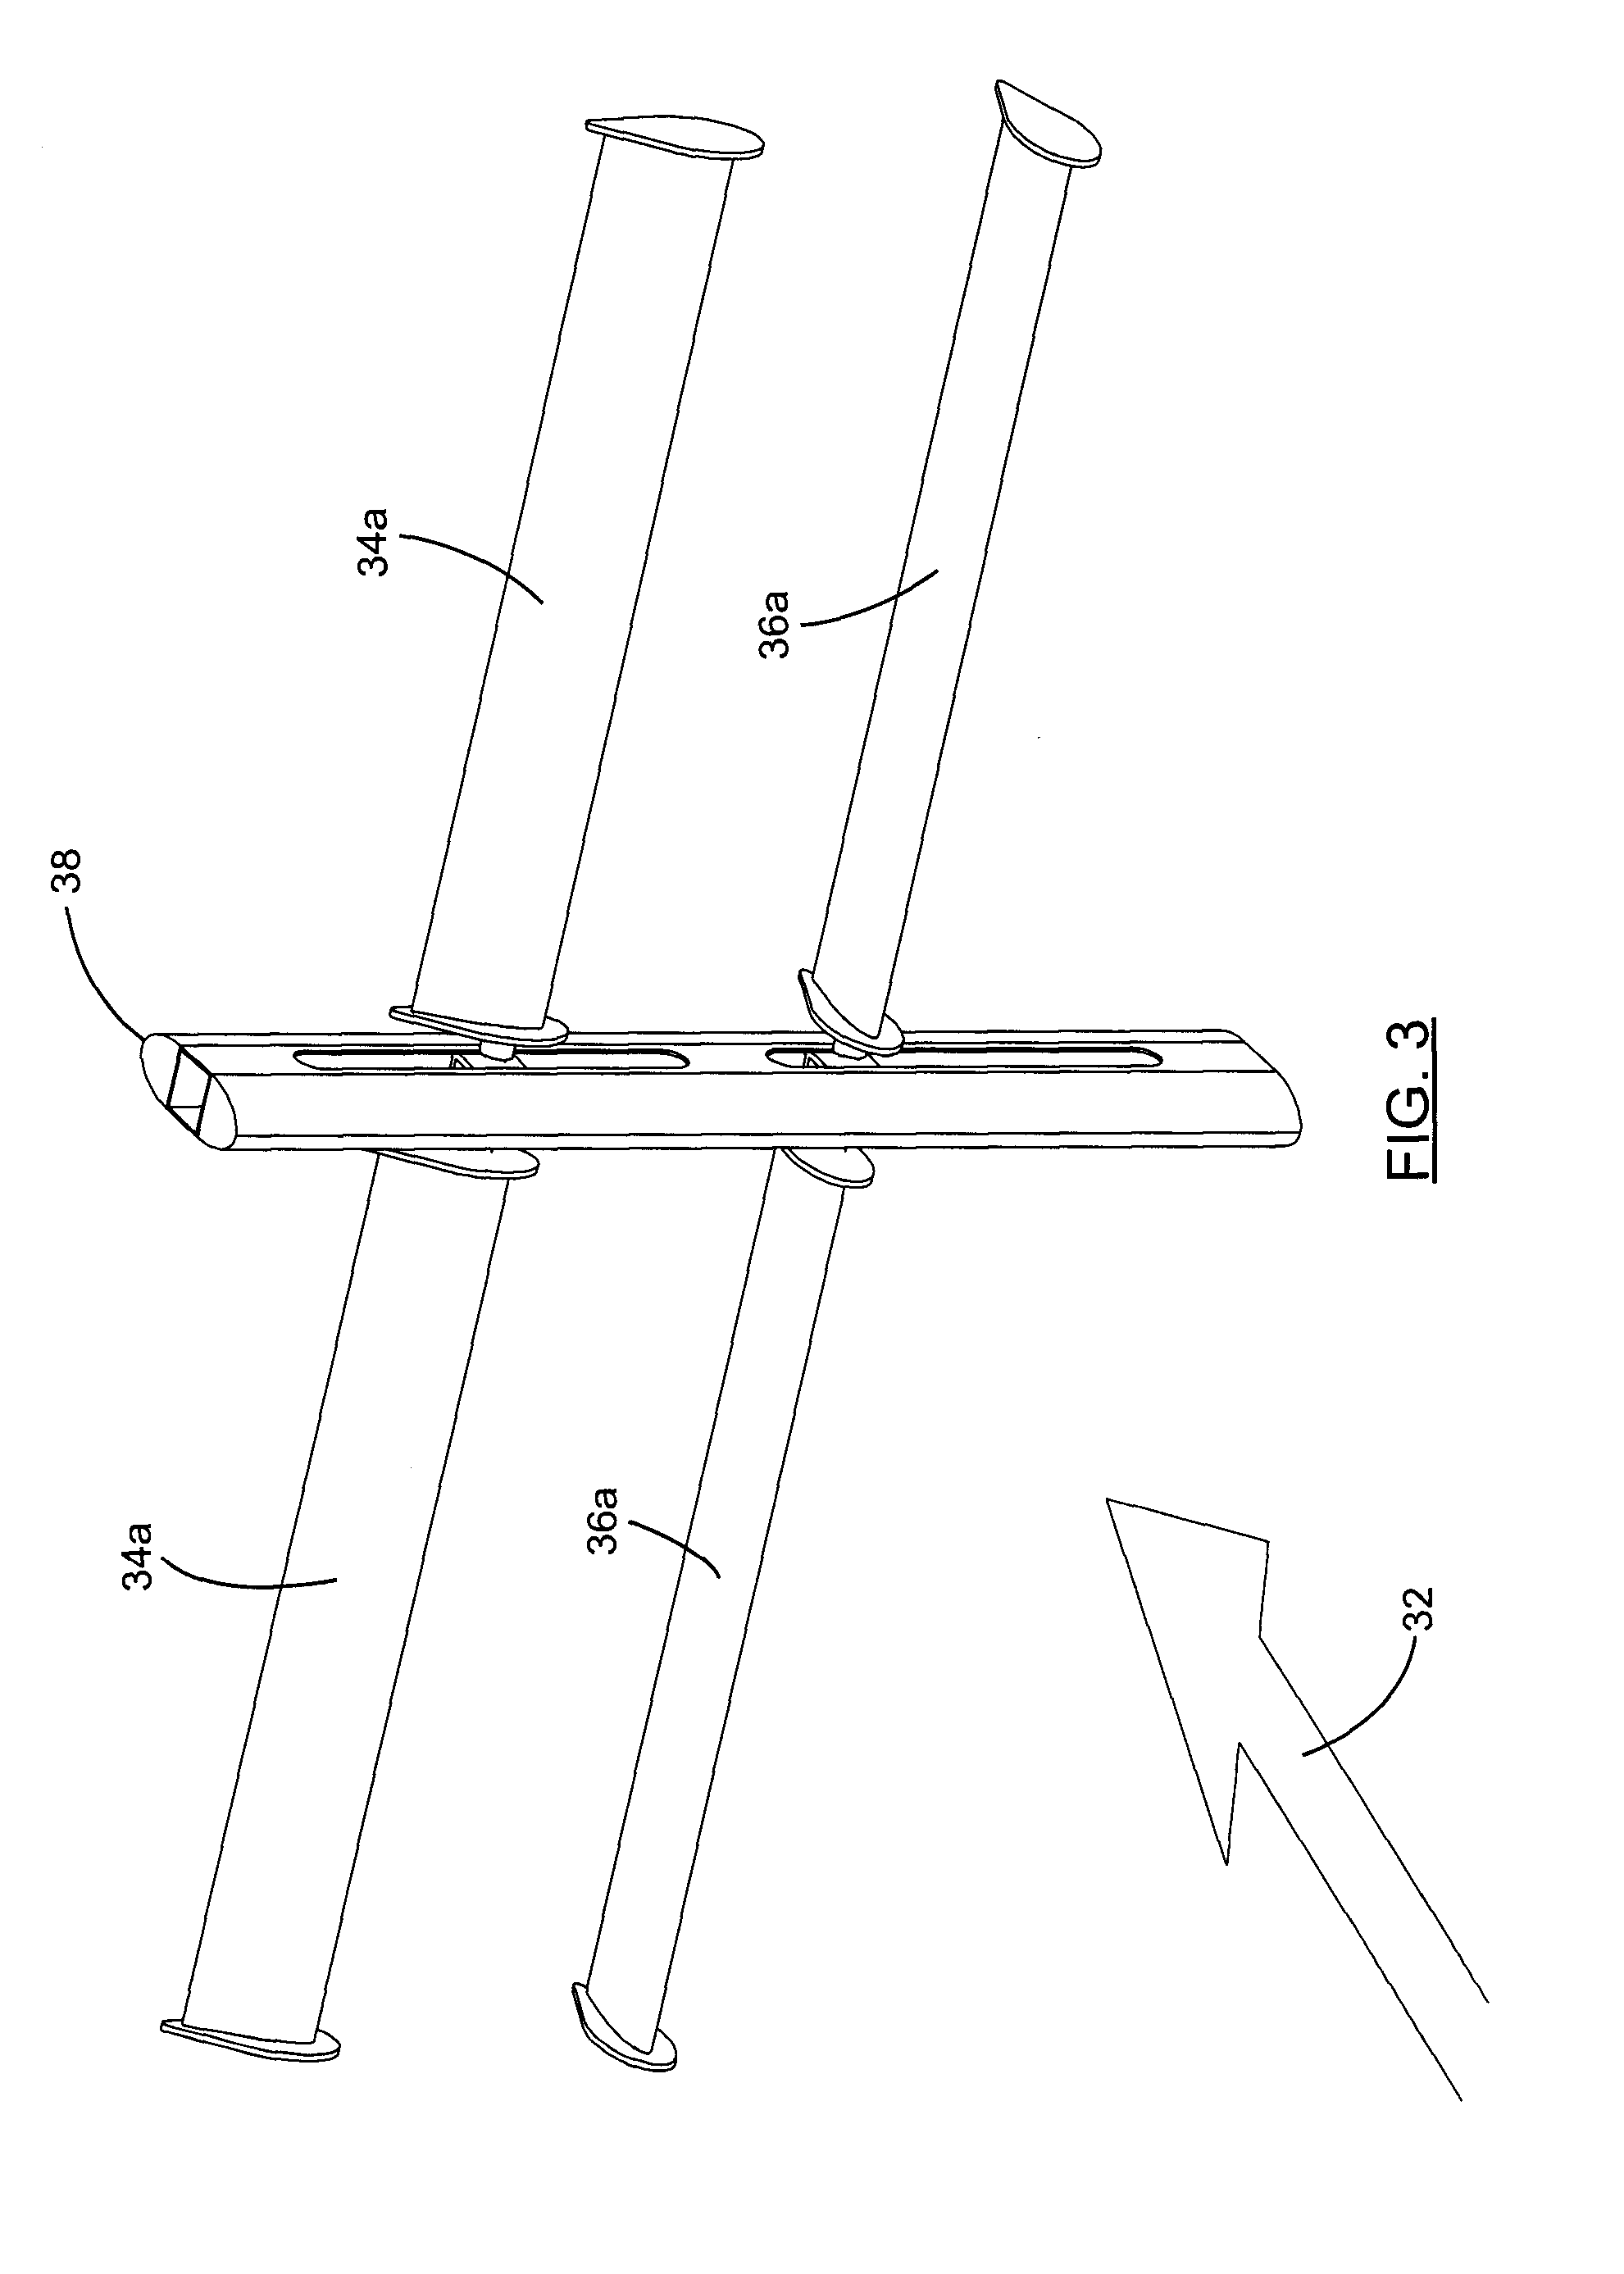 patent us20130202407 oscillating hydrofoil turbine. Black Bedroom Furniture Sets. Home Design Ideas